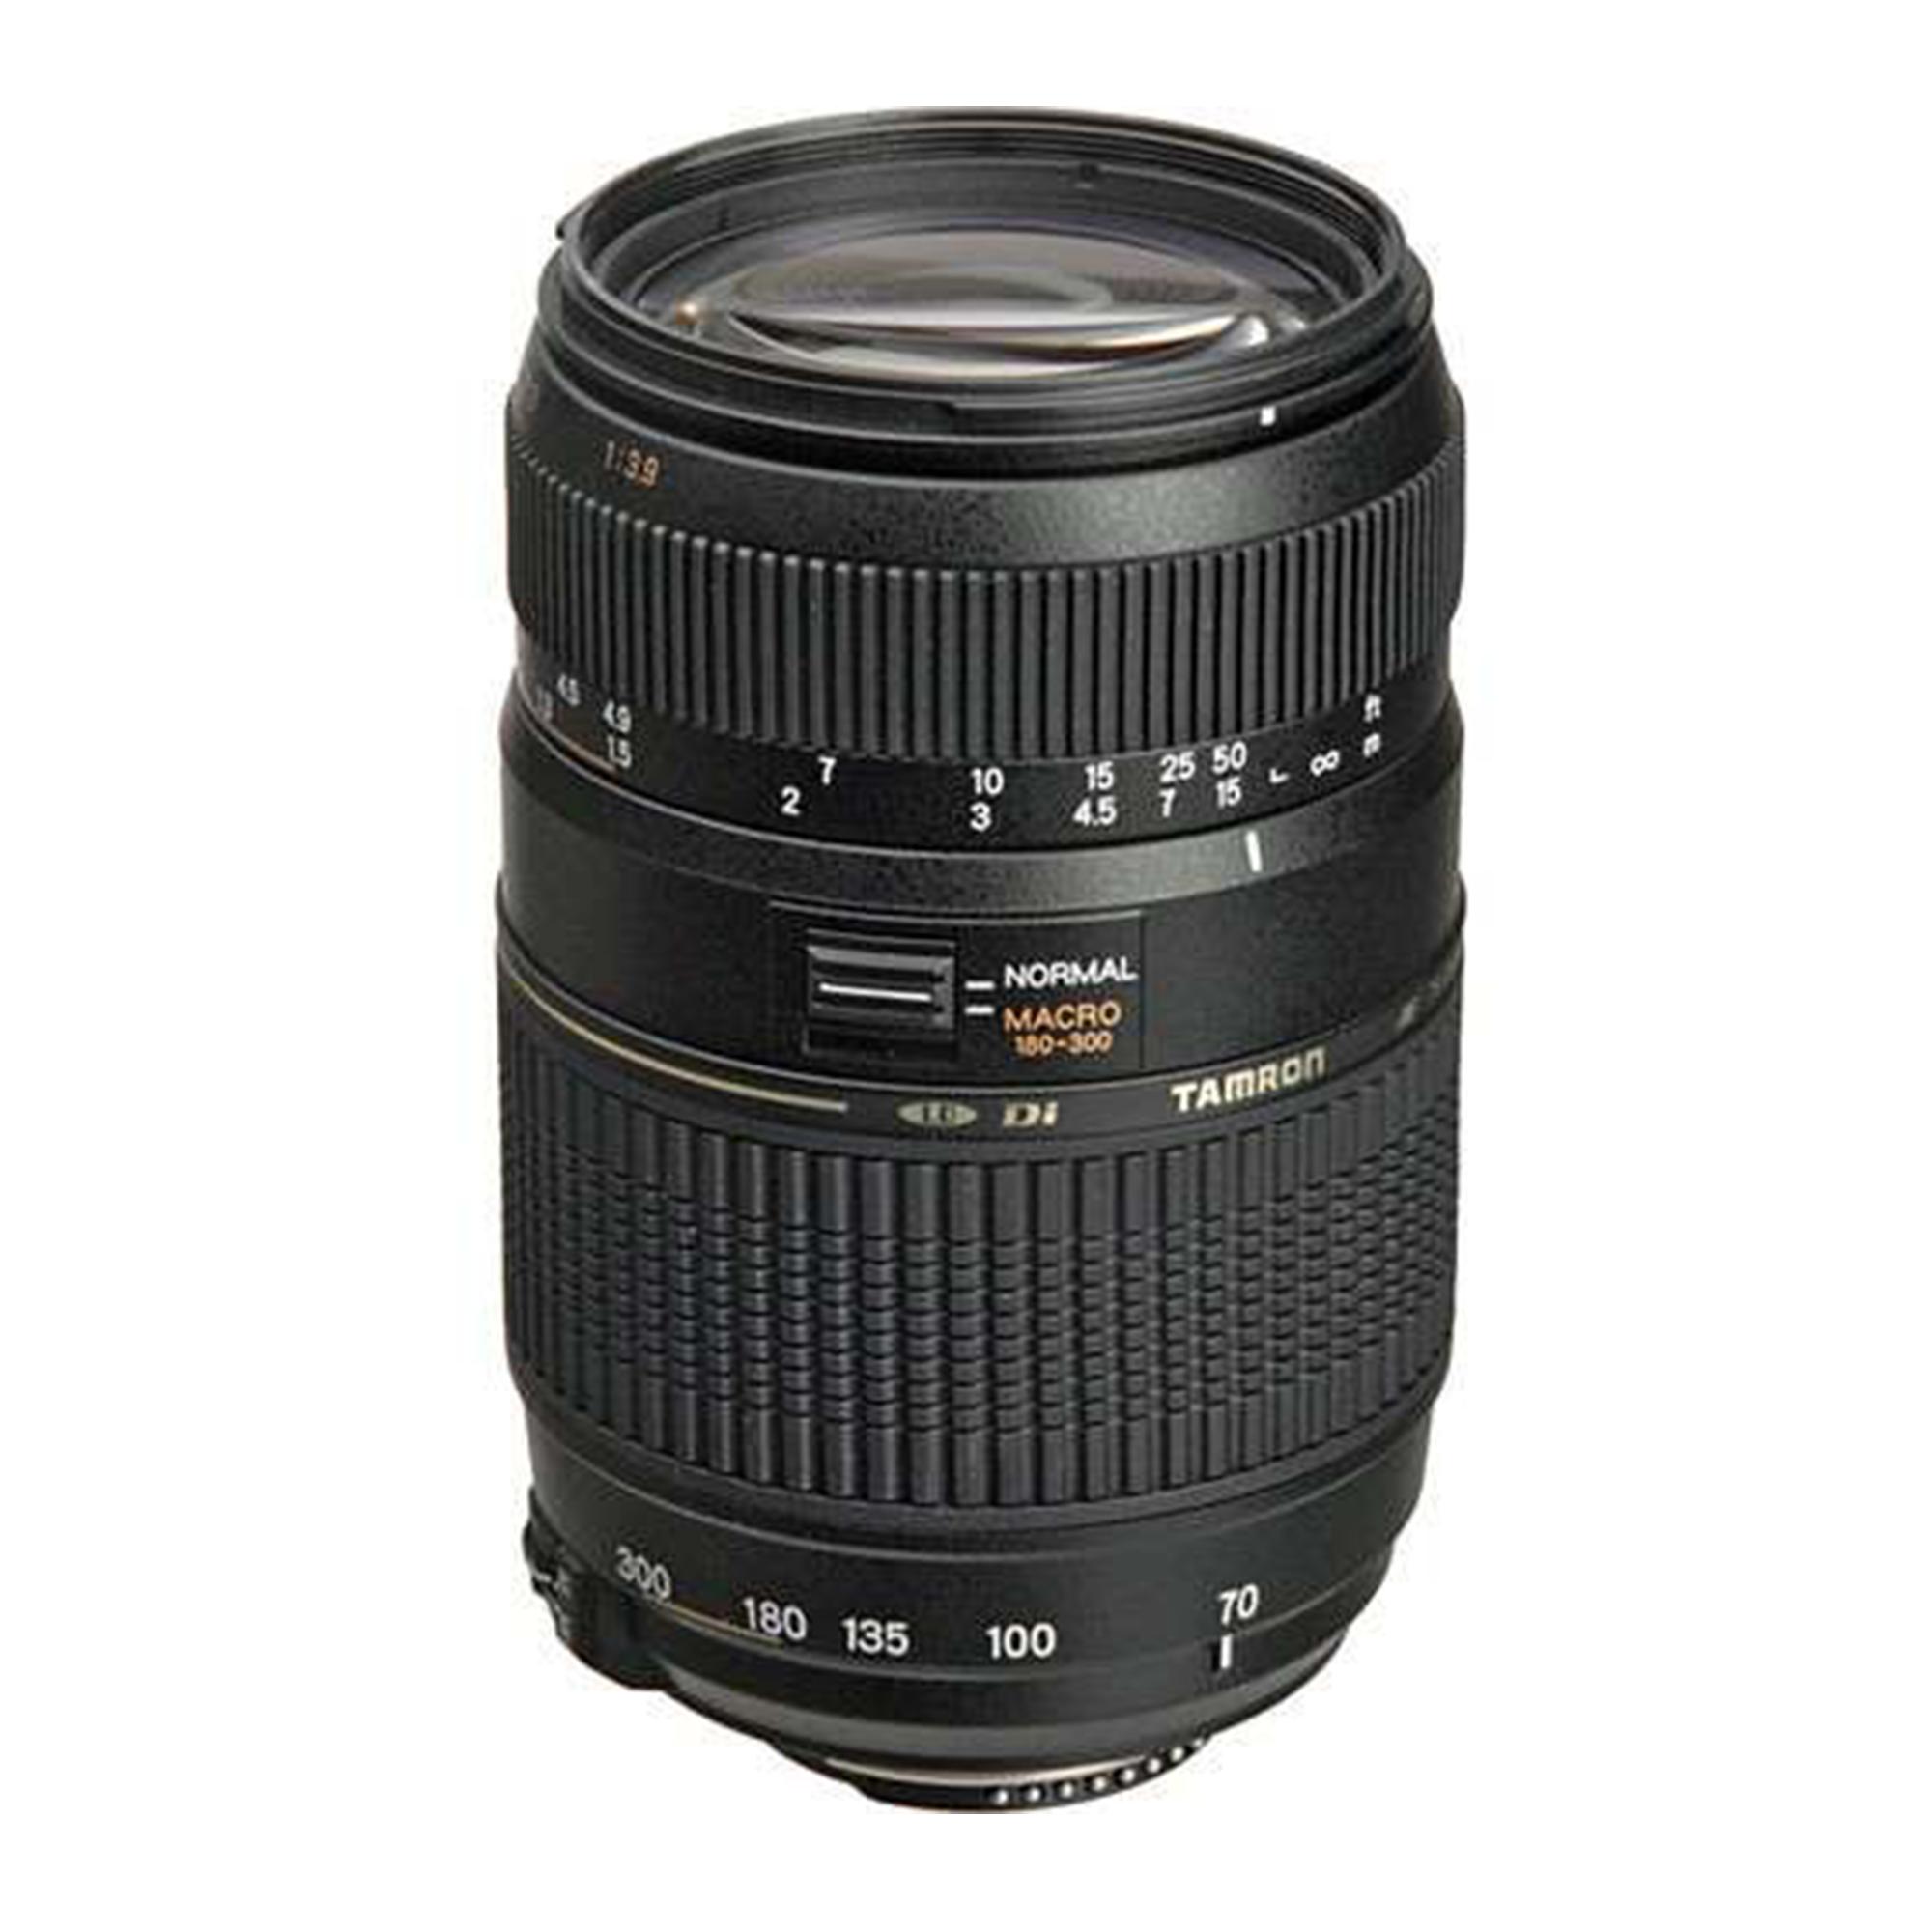 Tamron 70-300mm f/4-5.6 Di LD Macro Autofocus Lens For Canon